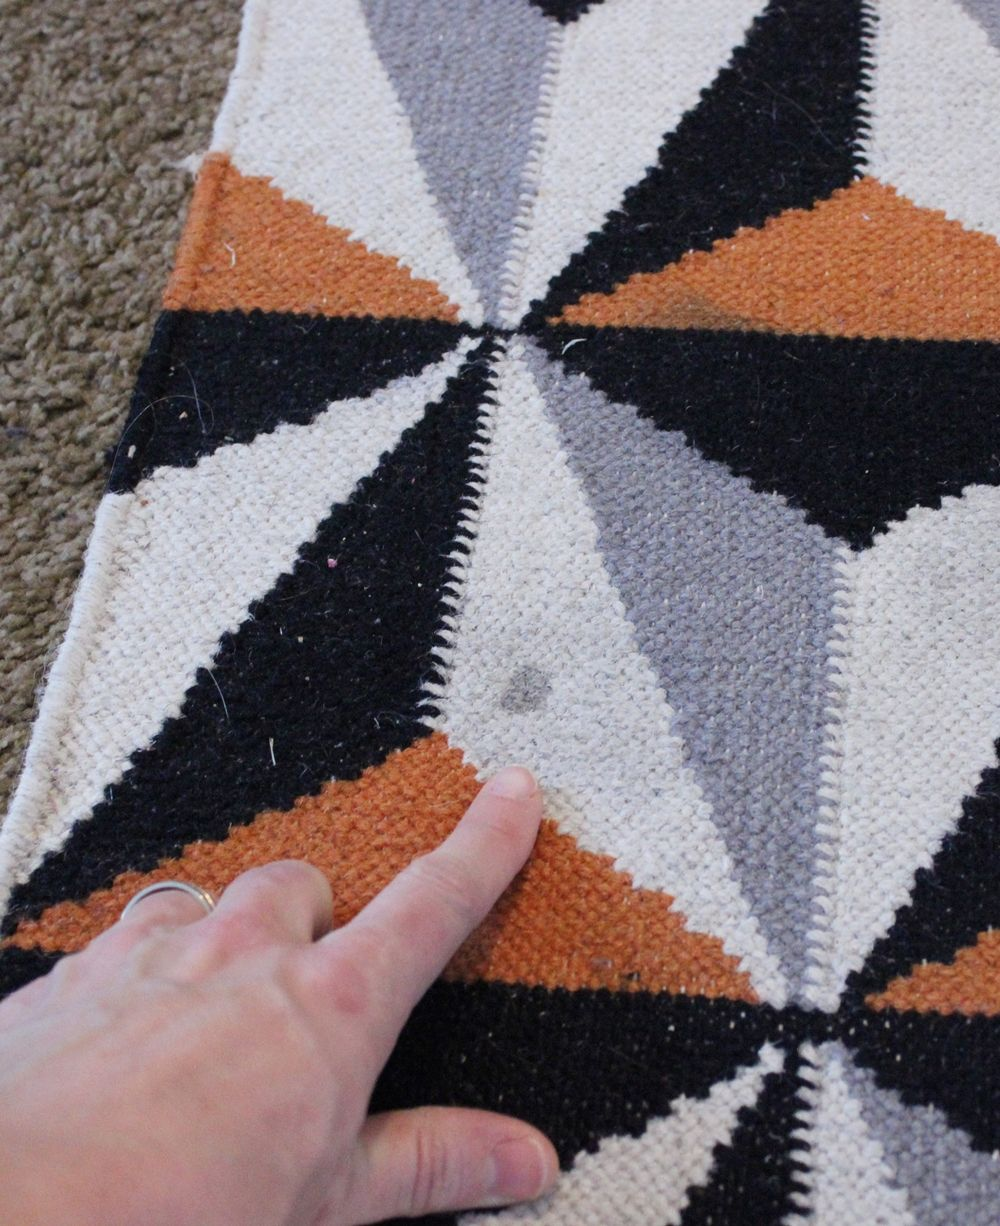 DIY Carpet Cleaner - soaking stain